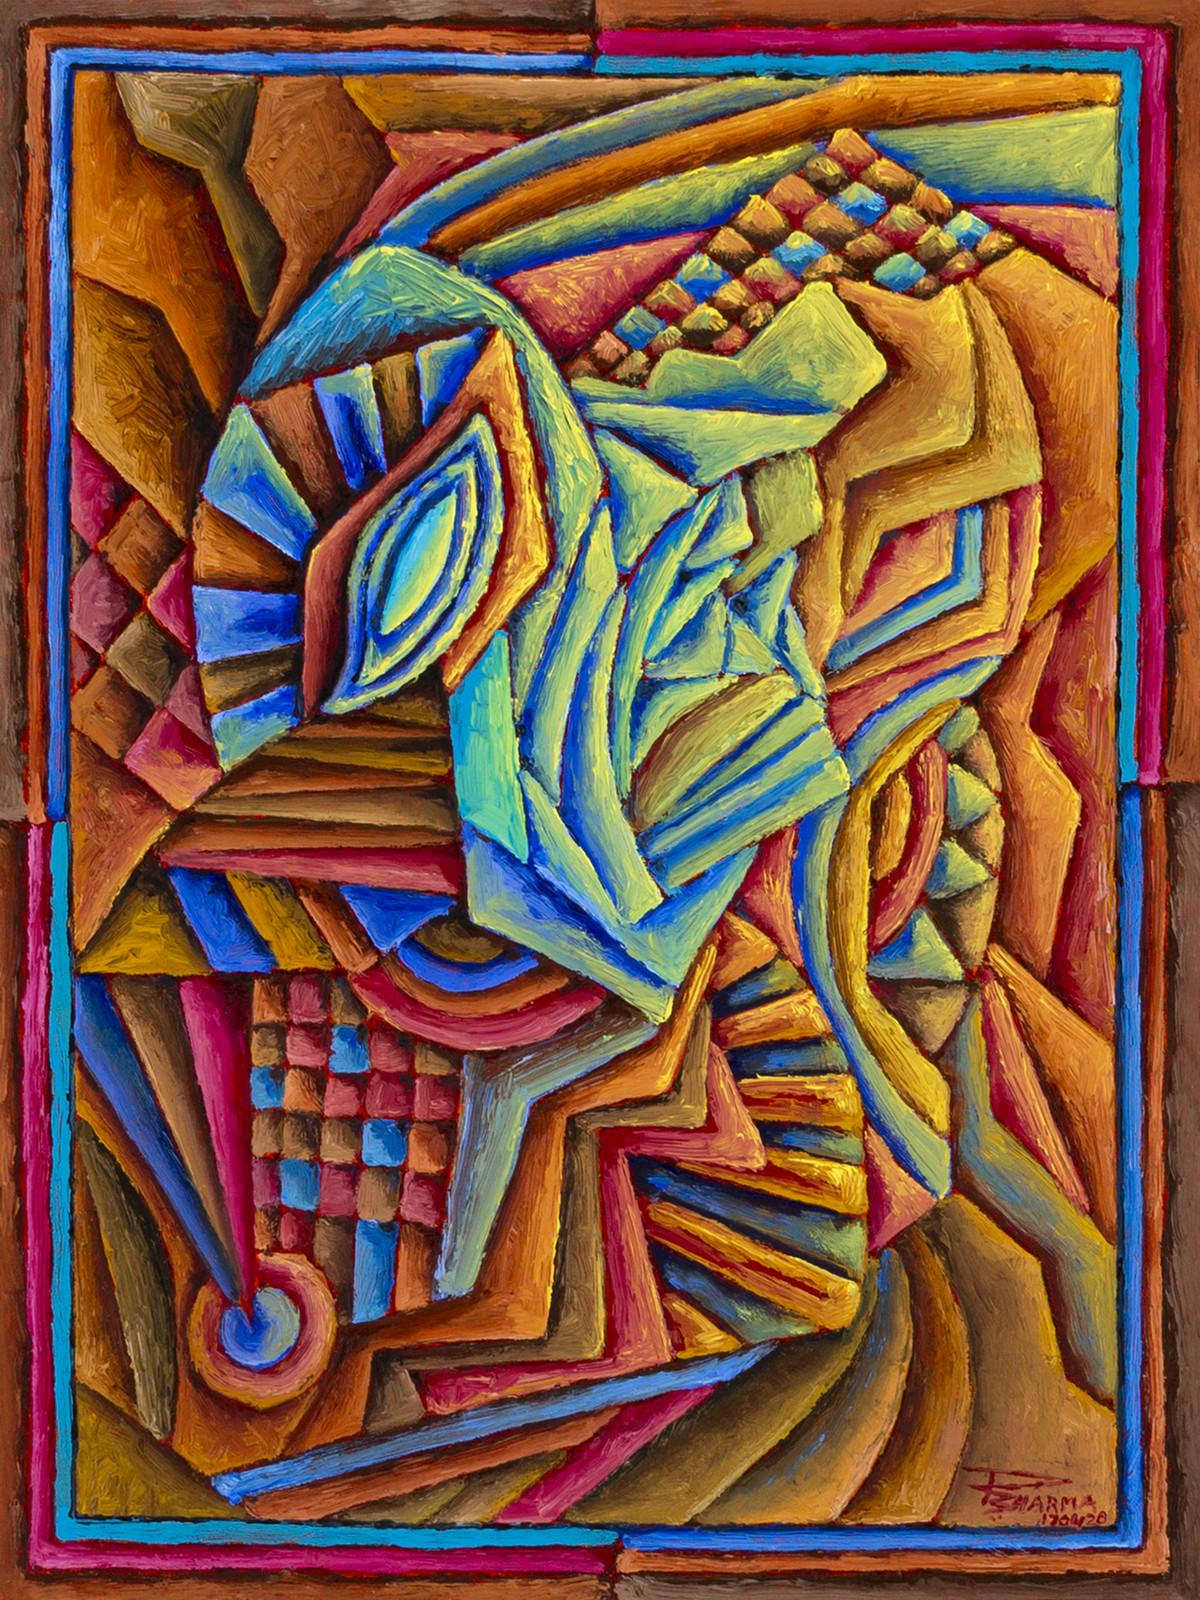 Untitled 170420 Digital Print by Ratish Sharma,Geometrical